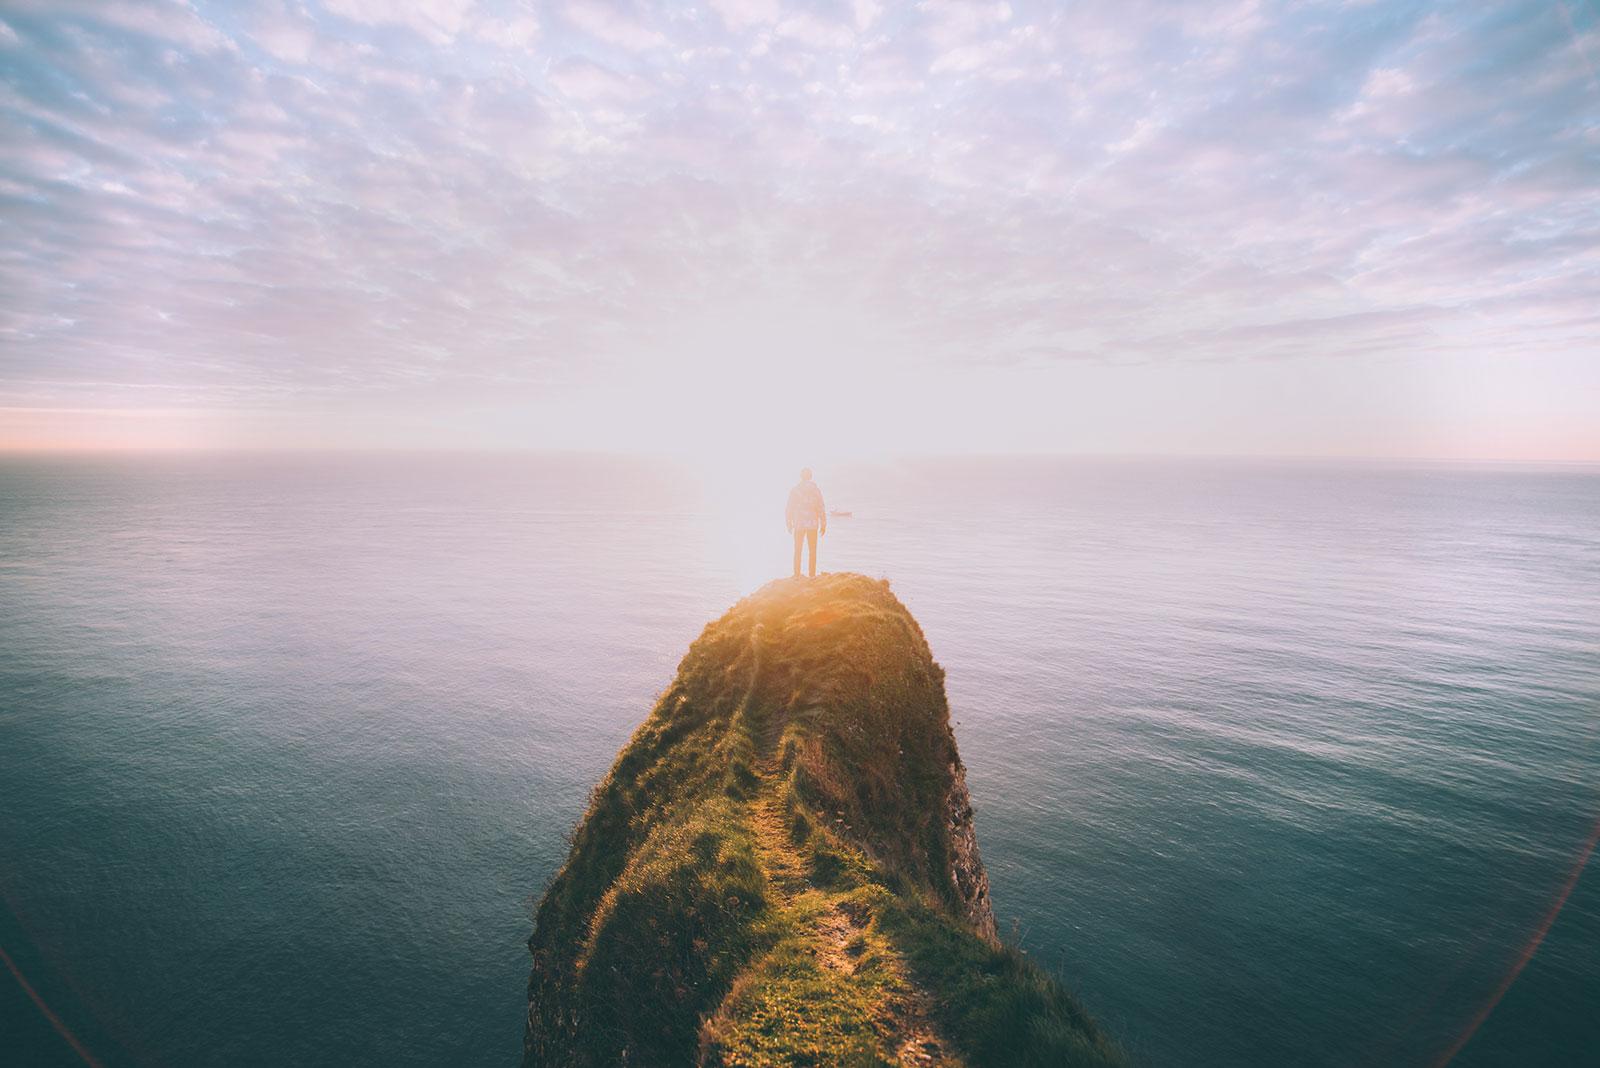 Grounding Spiritual Inspiration